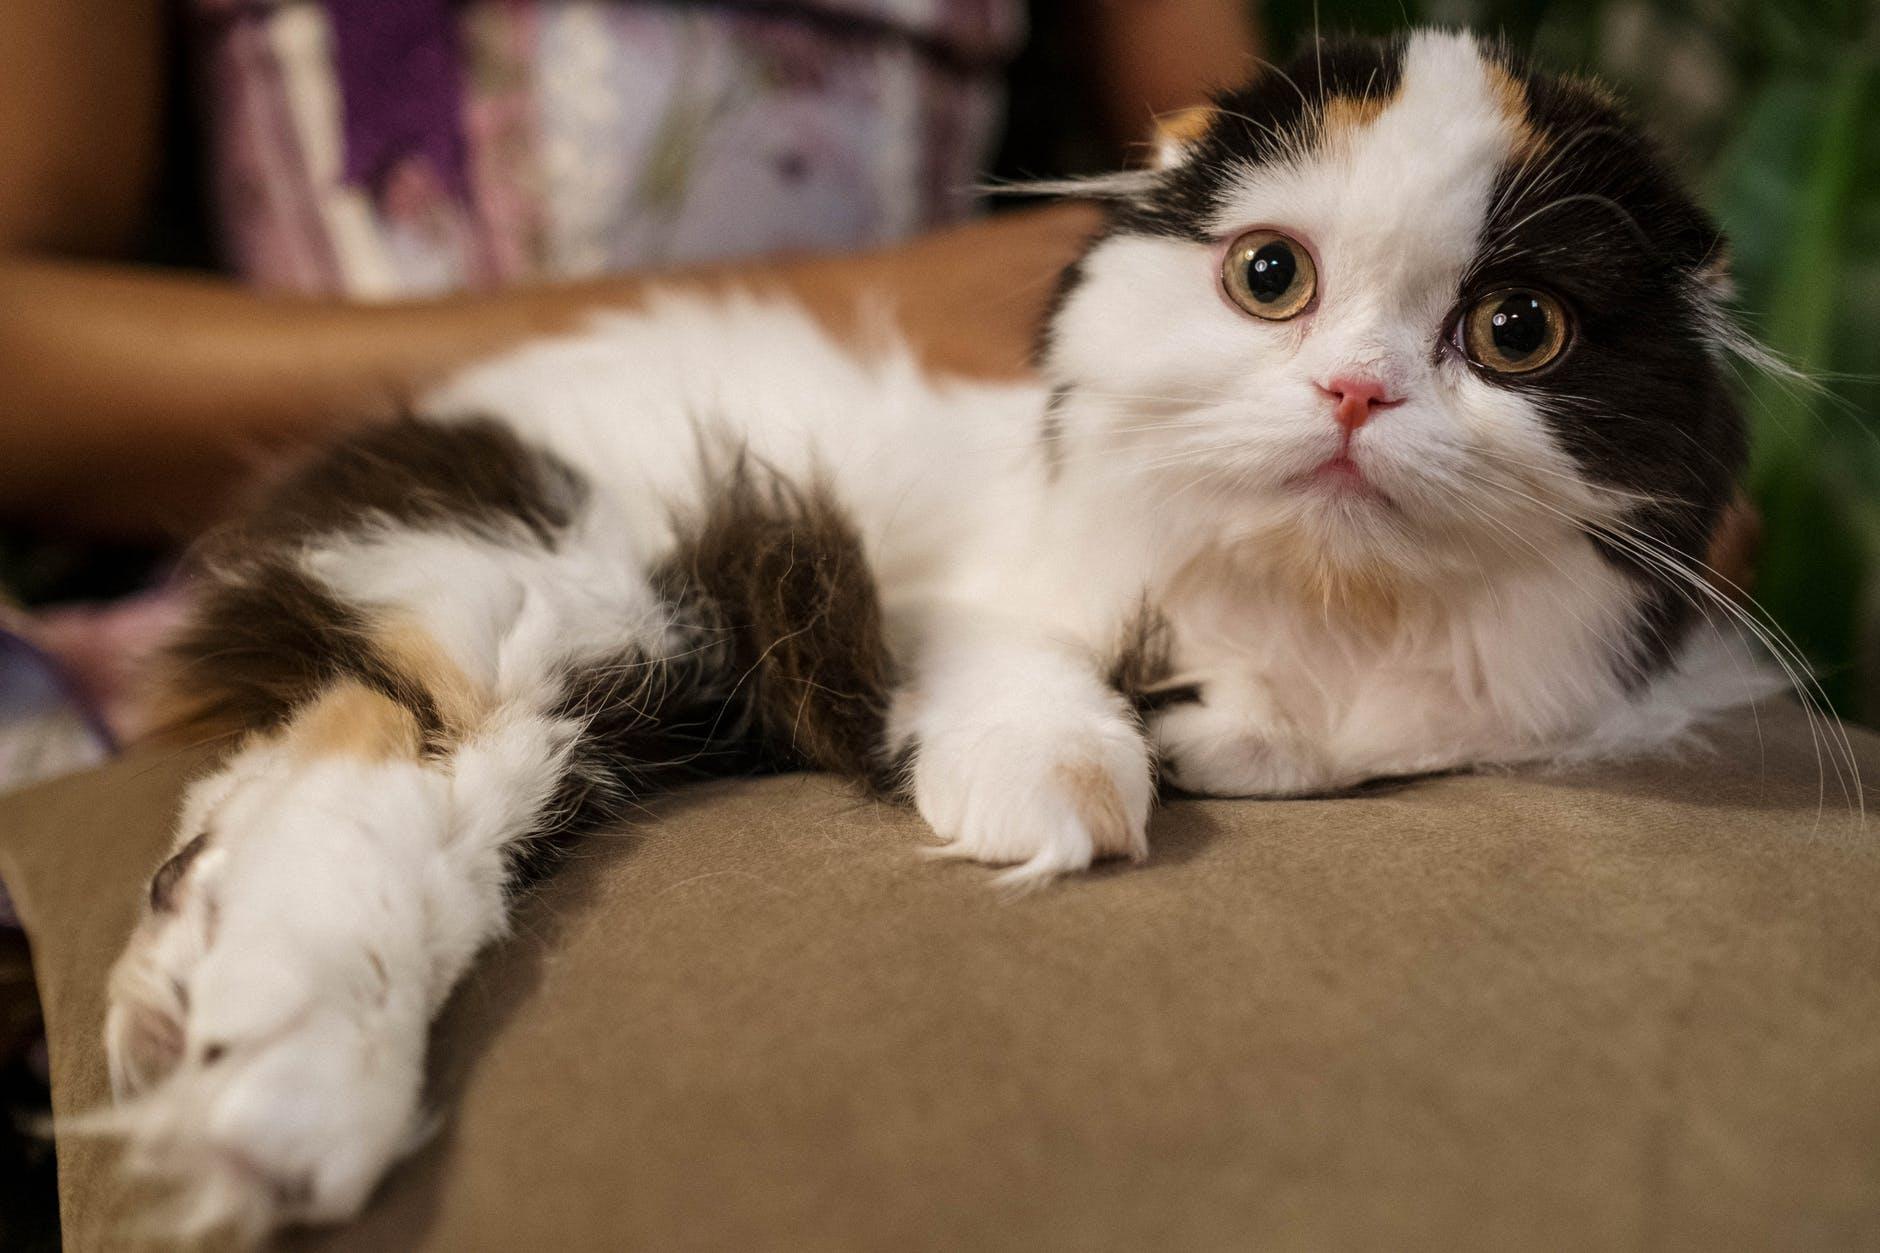 cute cat lying on pillow